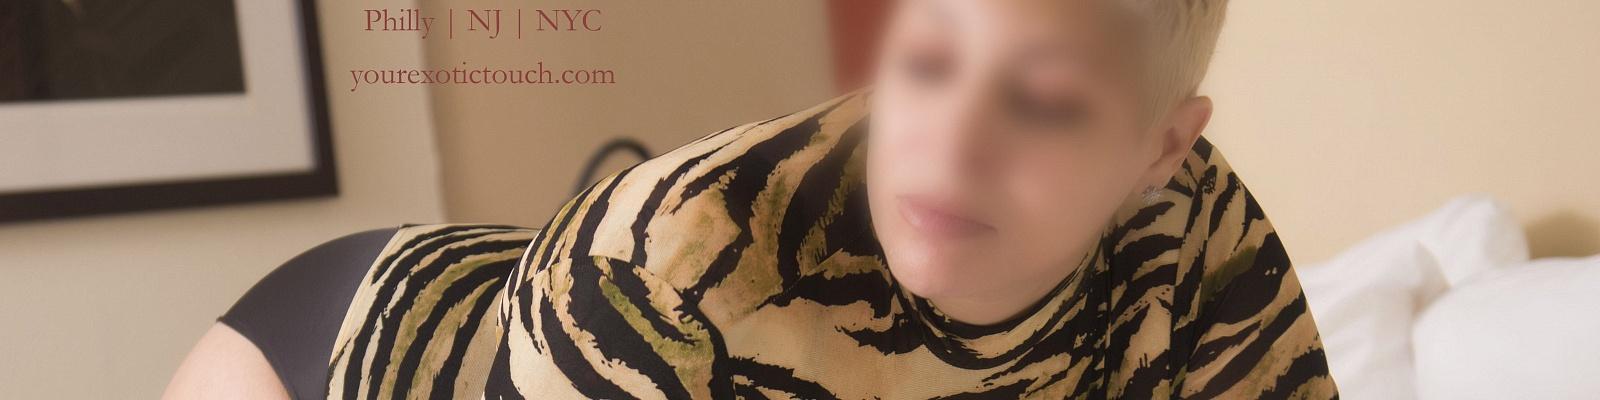 Ms Marisol's Cover Photo